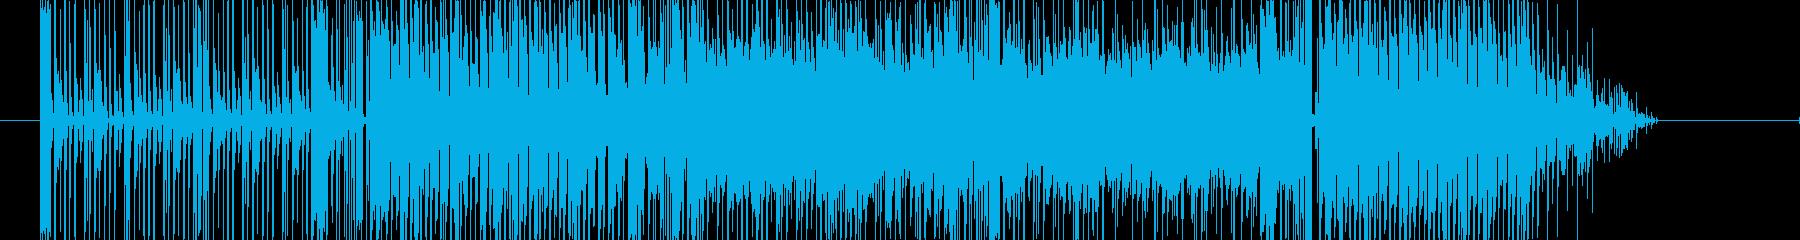 Zon Biの再生済みの波形